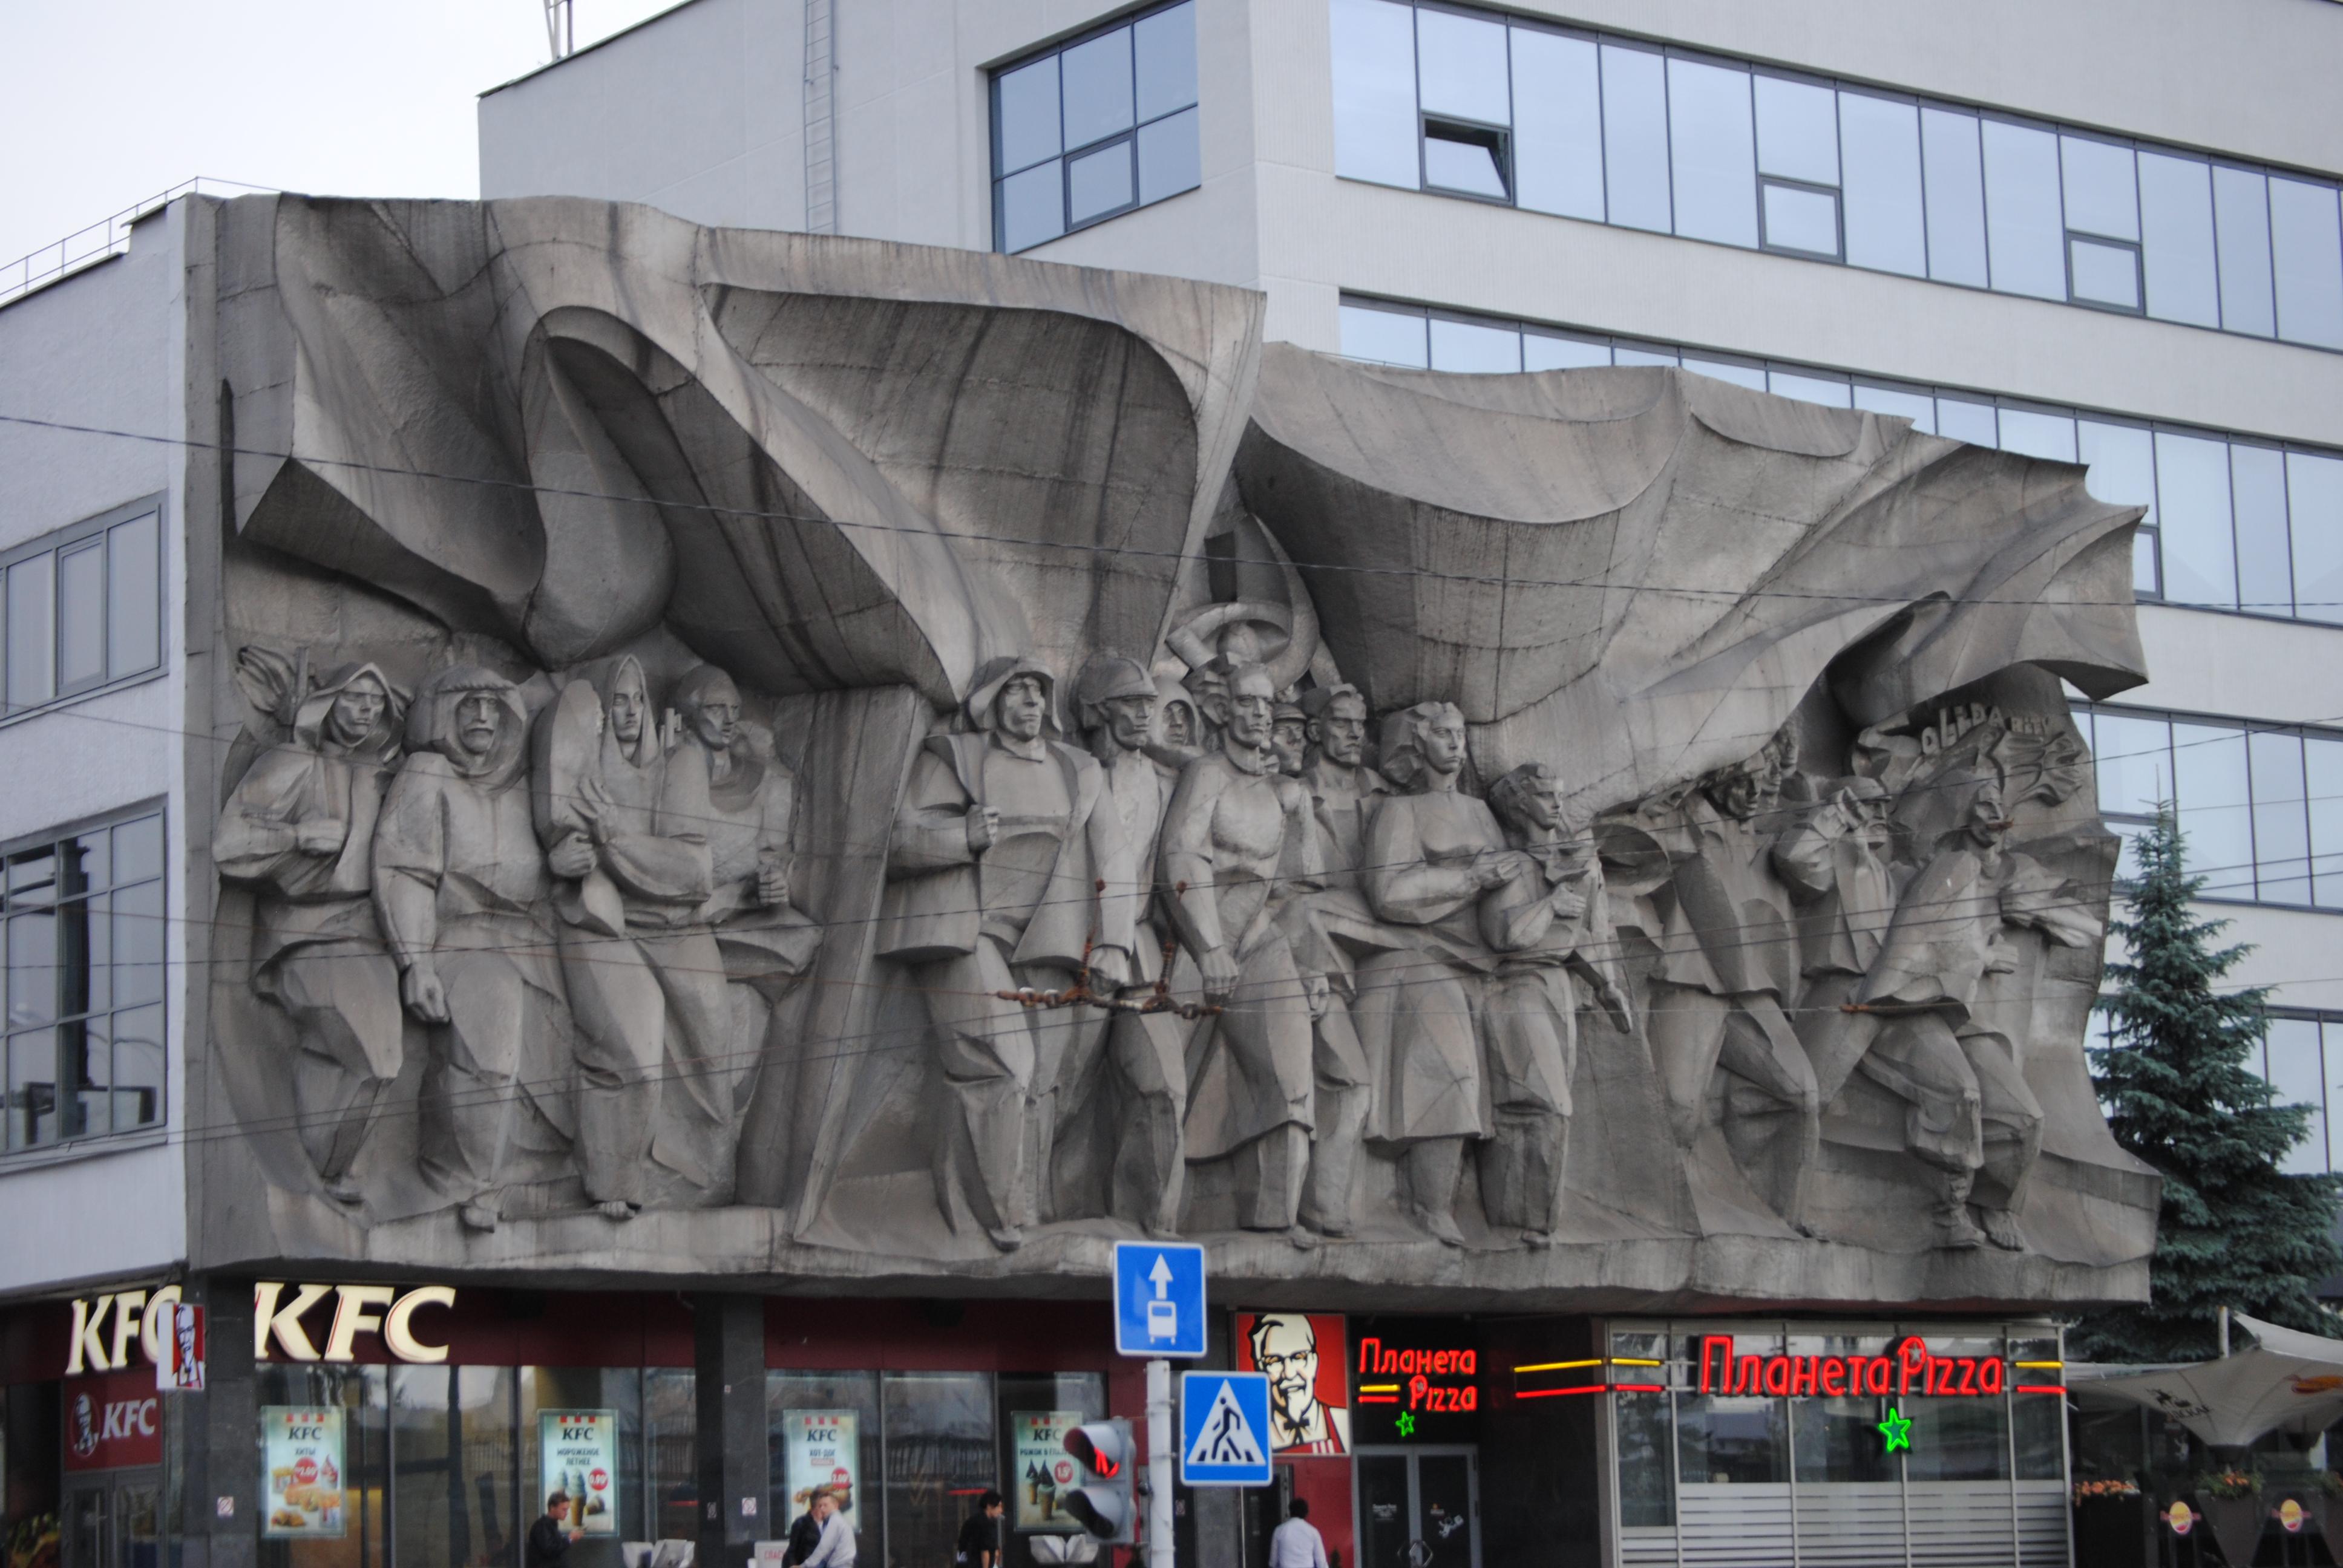 Mural con relieve, arquitectura socialista en Minsk, Bielorrusia